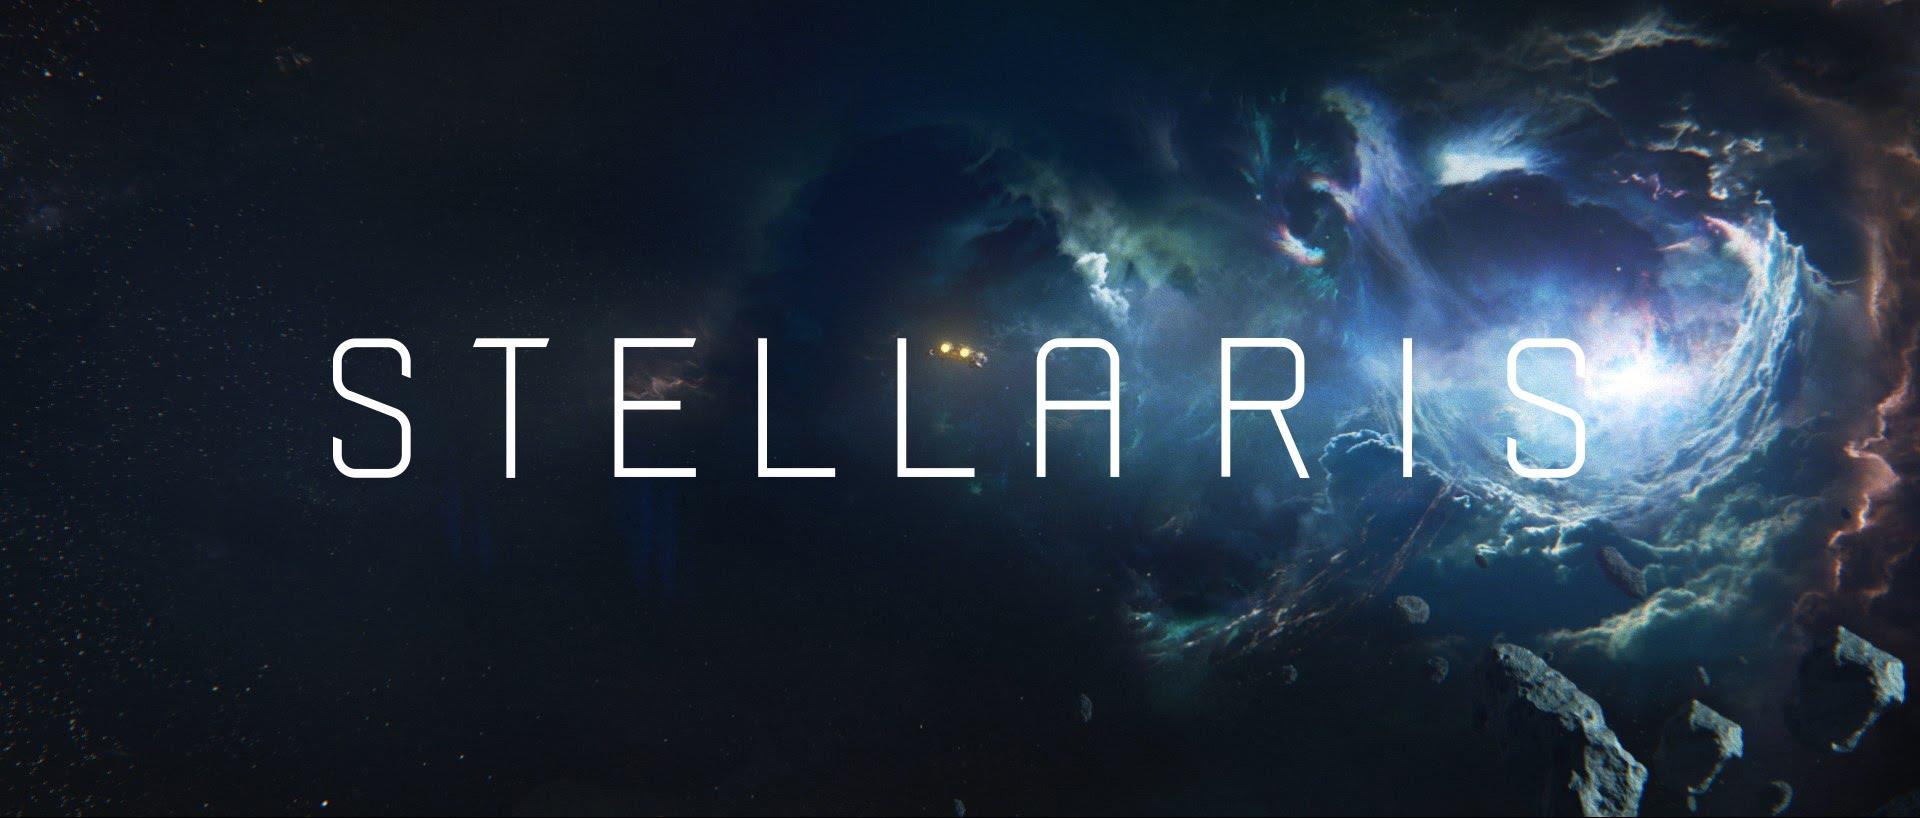 Stellaris: Boldly Explore the Galaxy